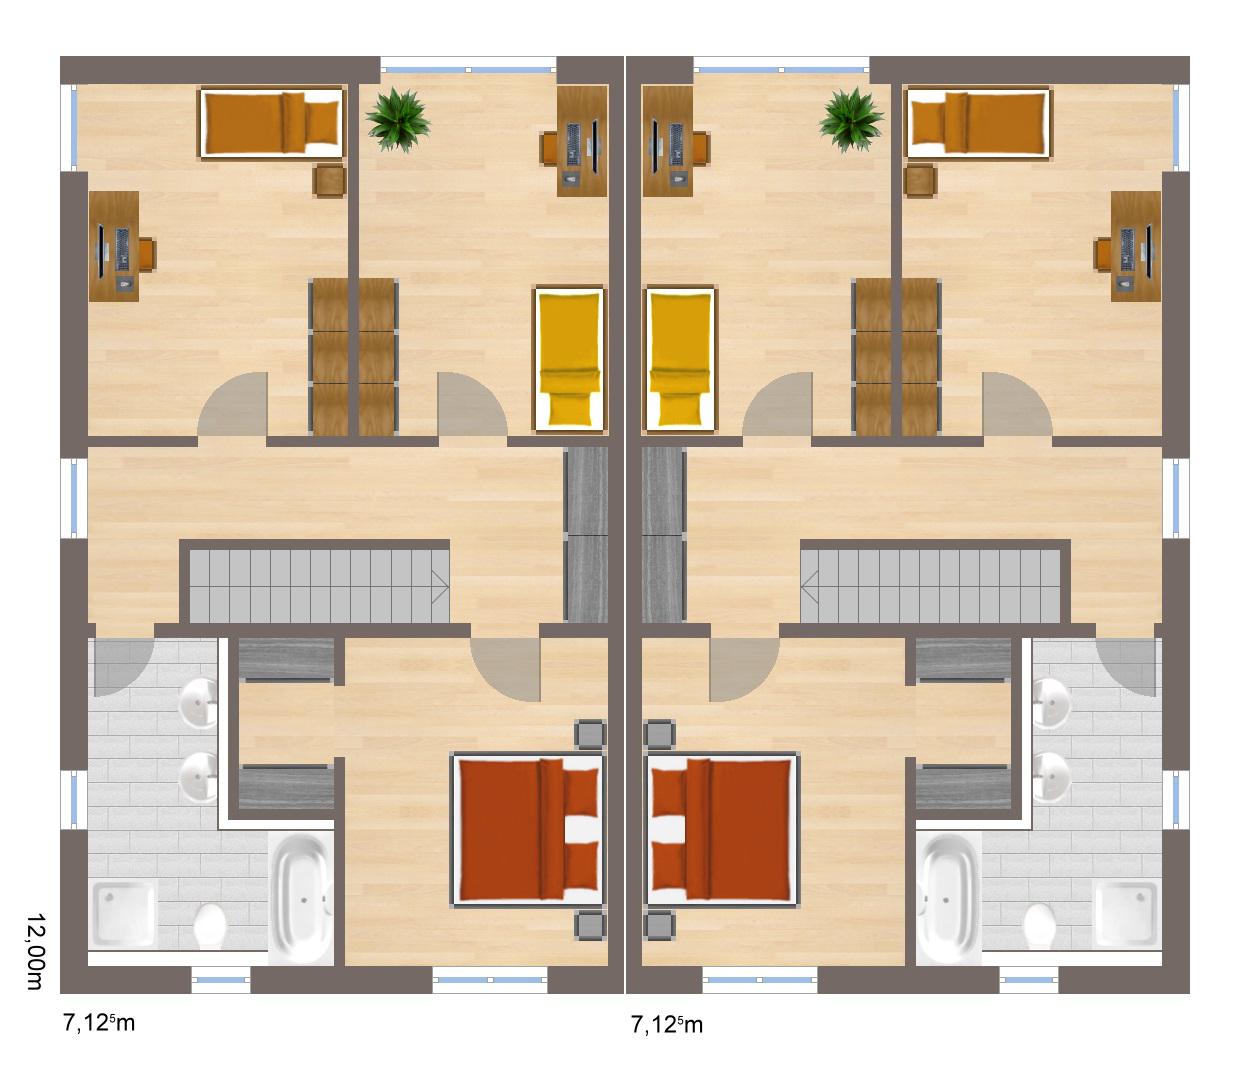 IZ Haus: Neubau, Massivhaus, Hausbau, Einfamilienhaus, Bauen, Fertighaus,